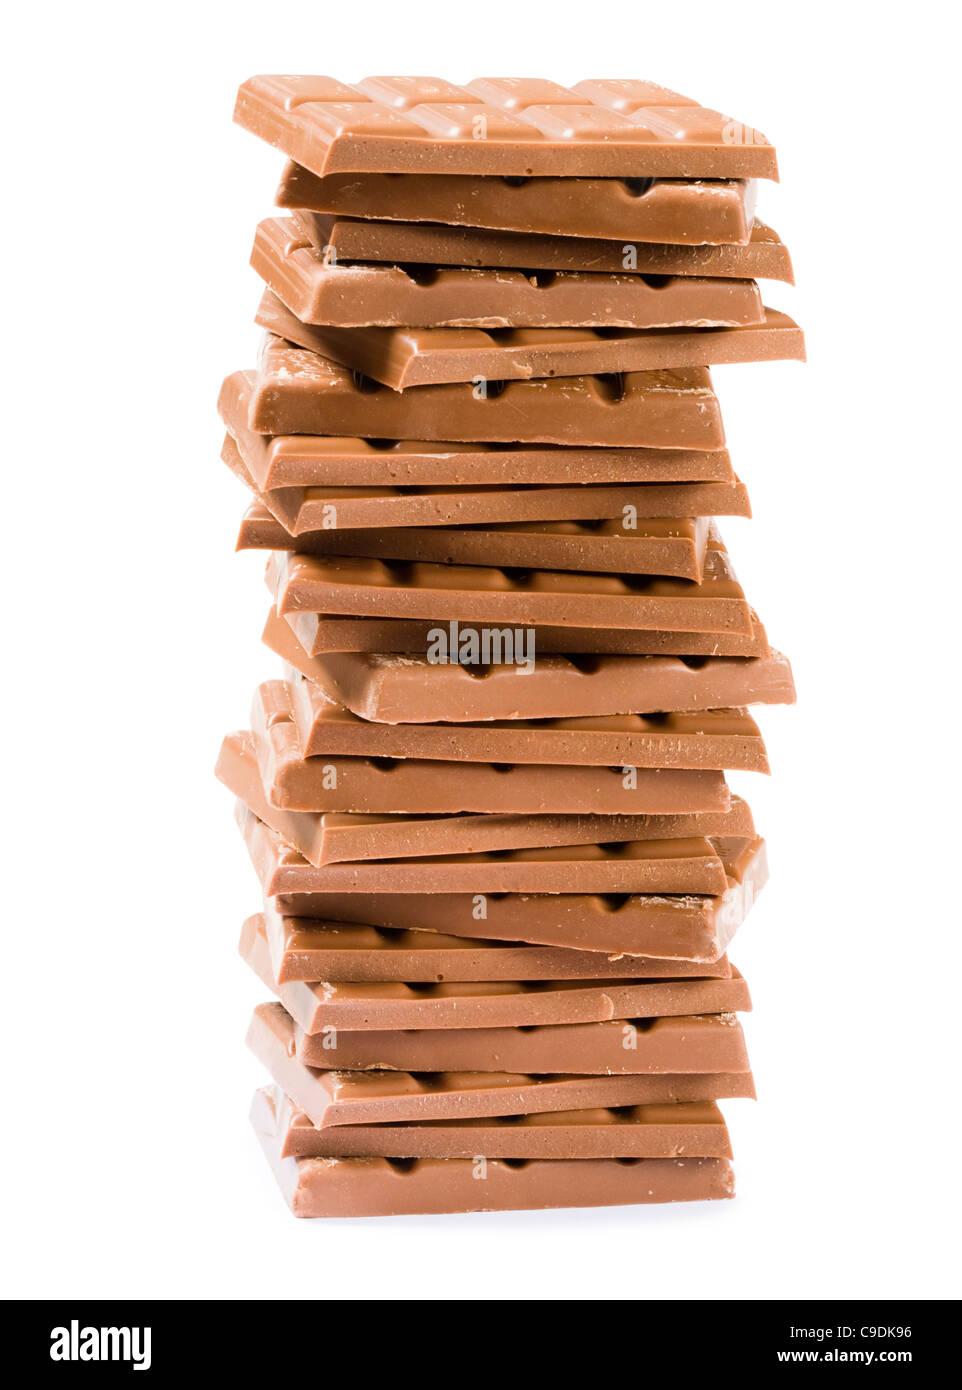 Pila de chocolate. Imagen De Stock